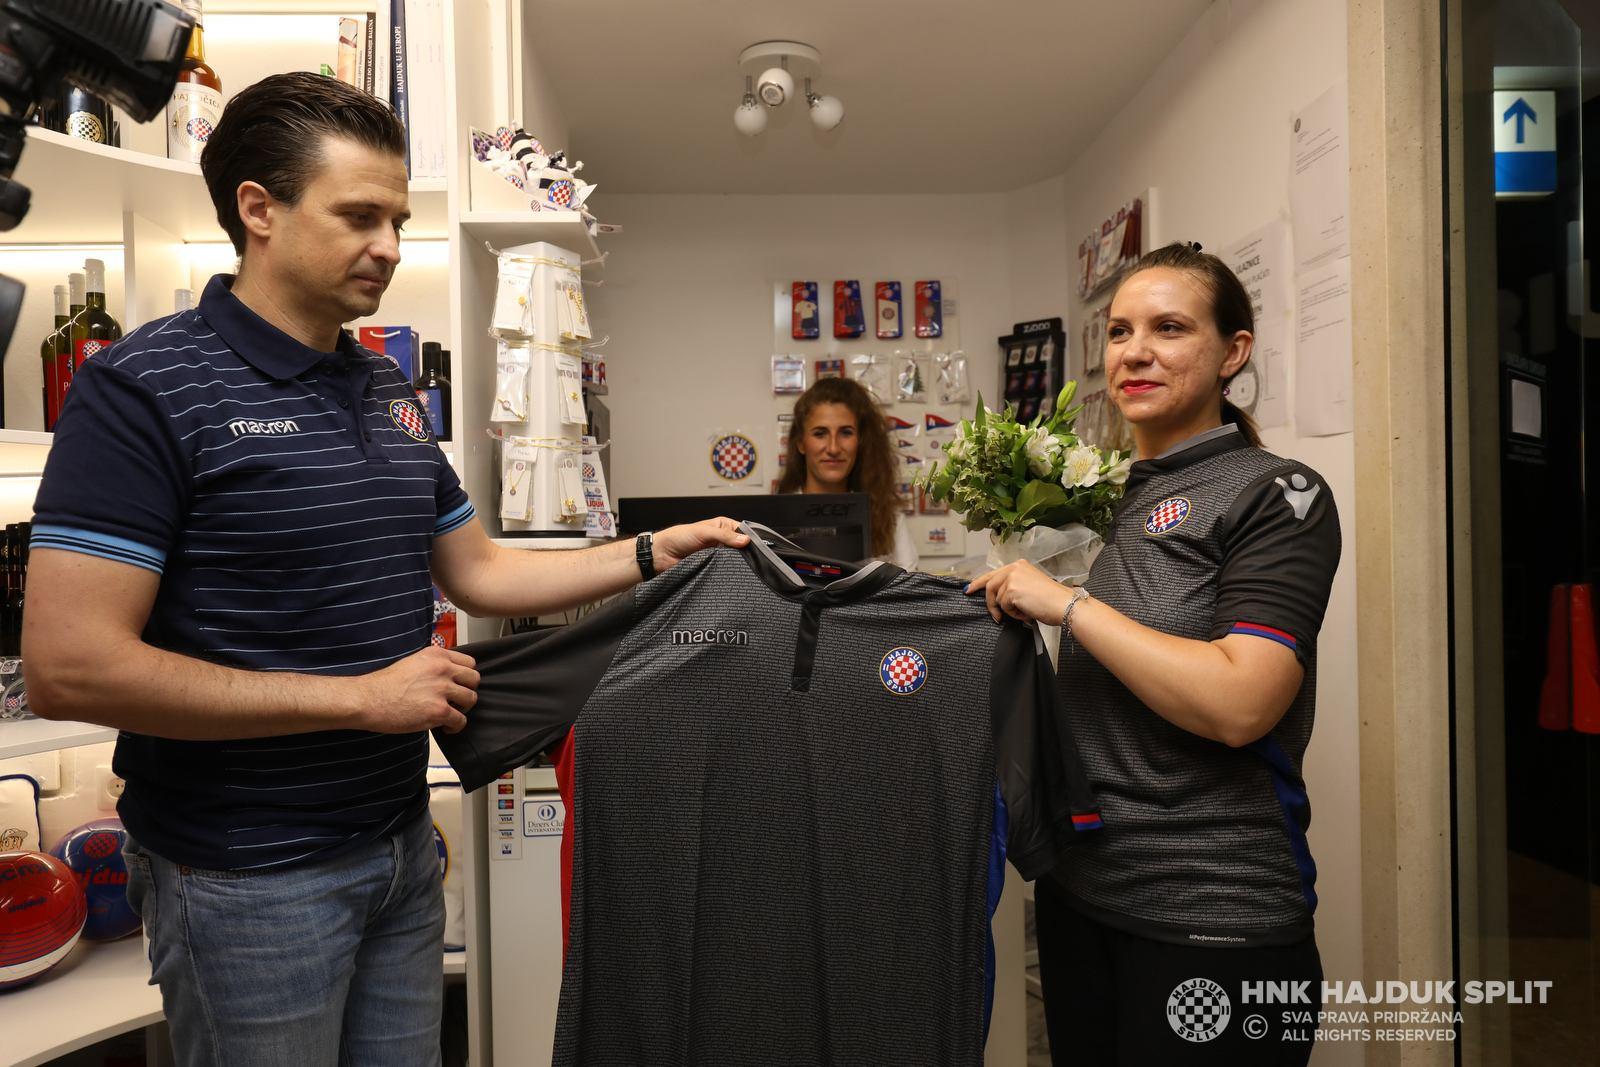 Tercera camiseta Macron del Hajduk Split | Foto Web Oficial